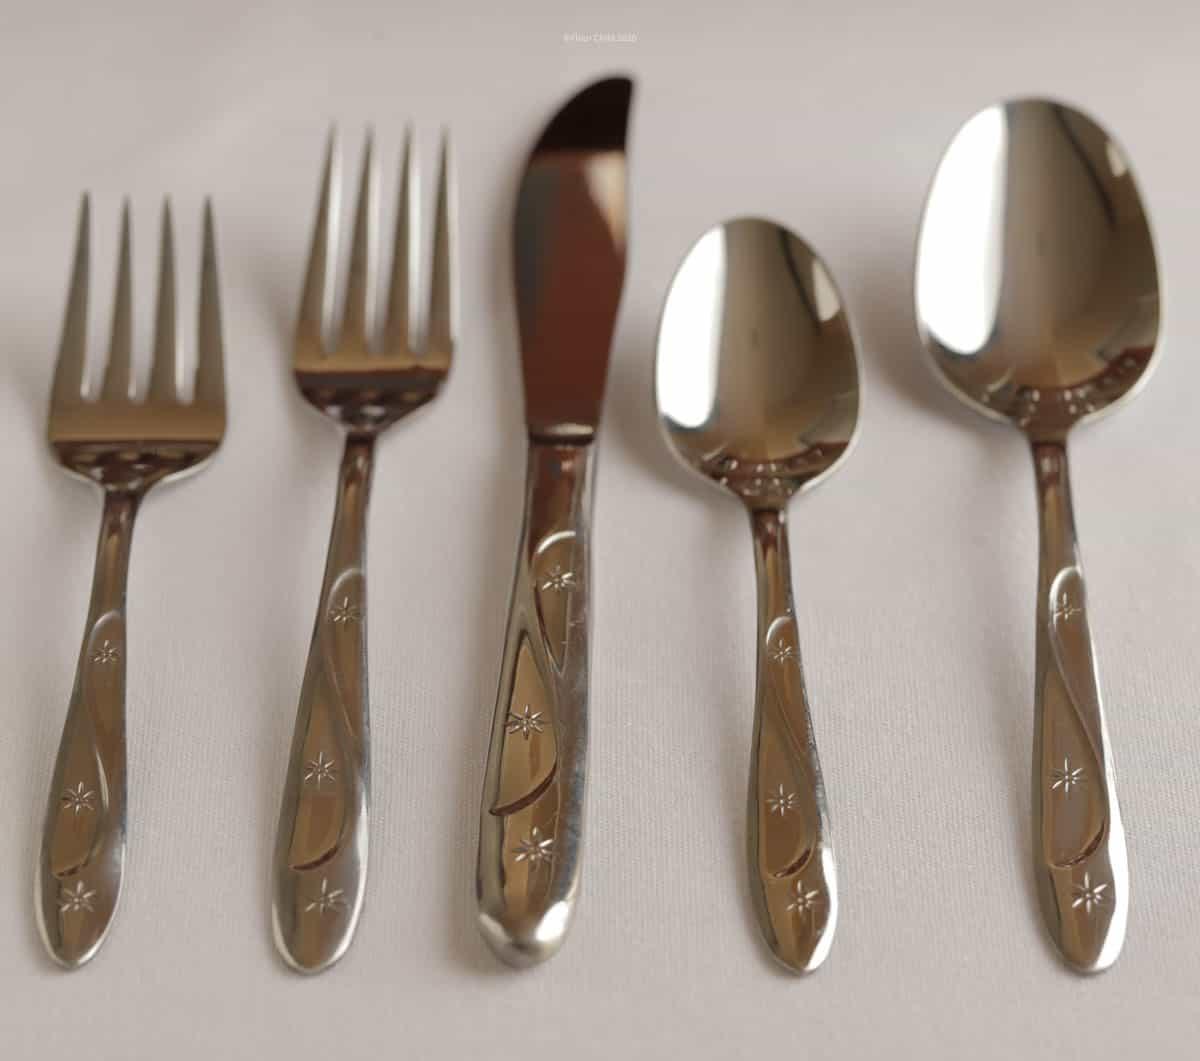 Tablespoon, teaspoon, knife, dinner fork and salad fork in Americana Star flatware pattern